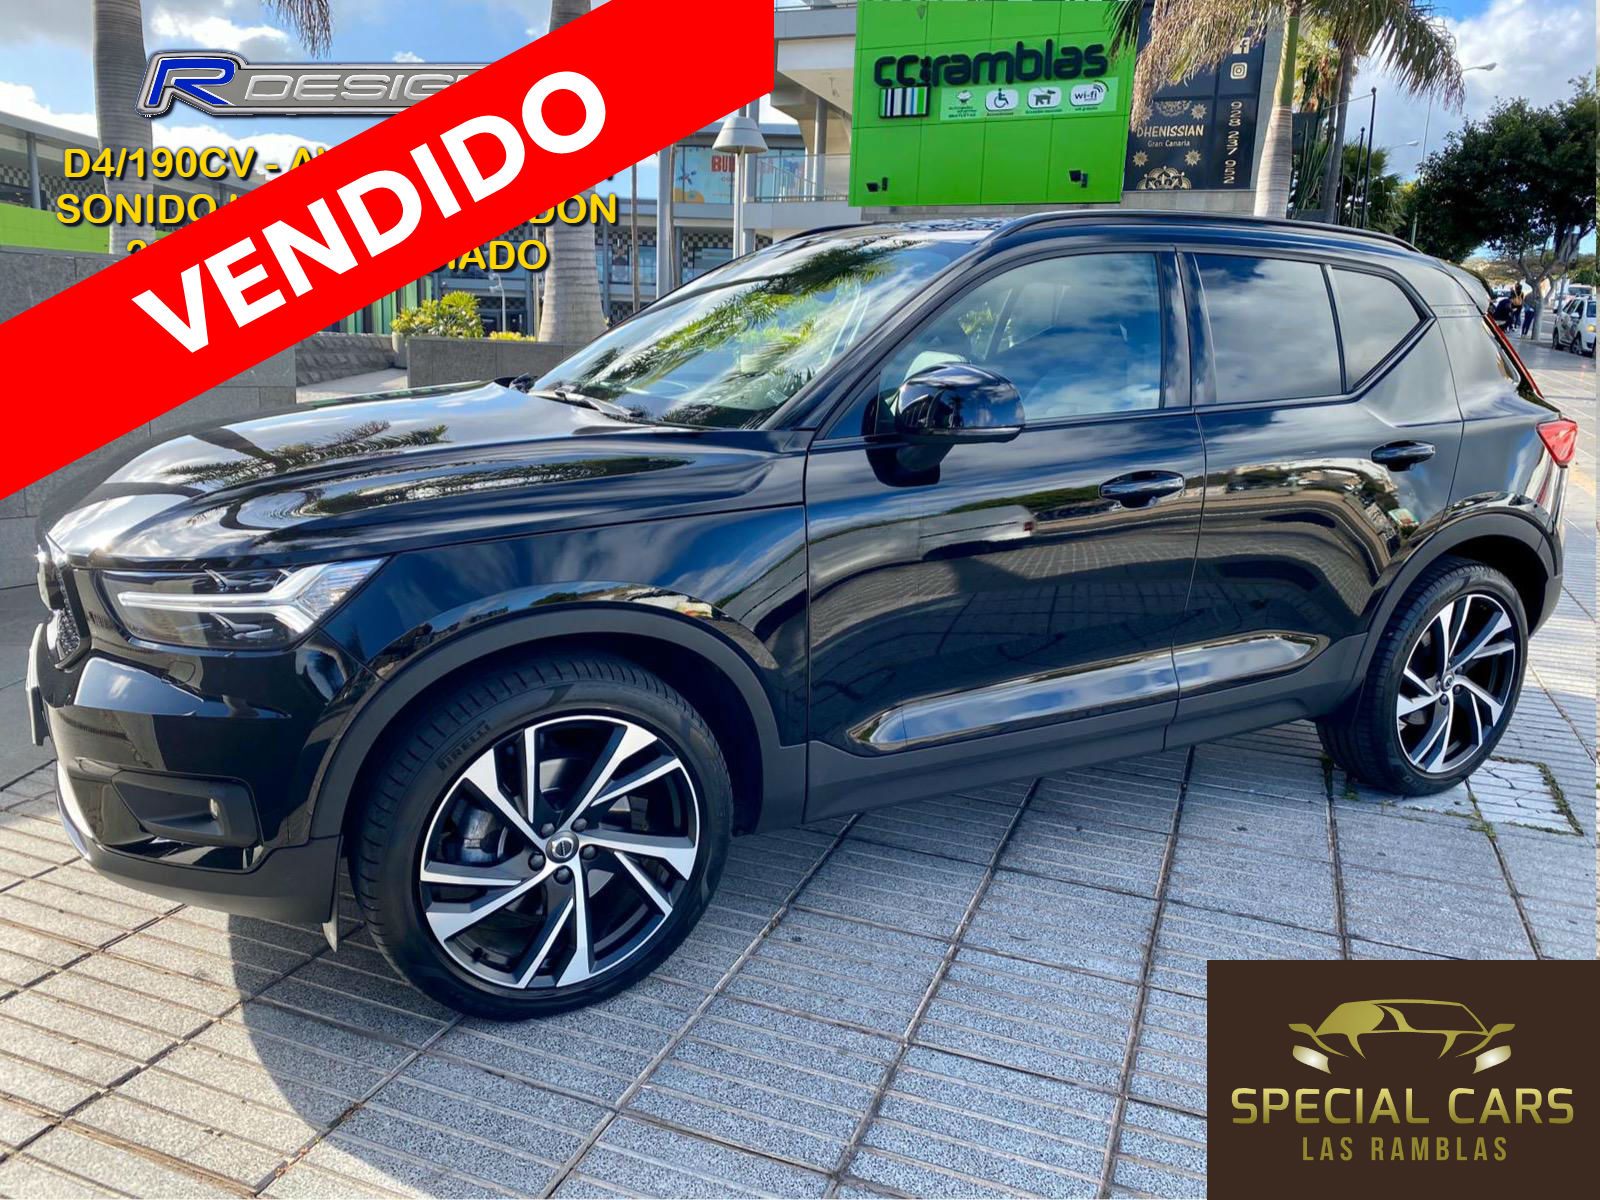 XC40 R-DESING D4 AWD 2018 ENE20 (1) VENDIDO